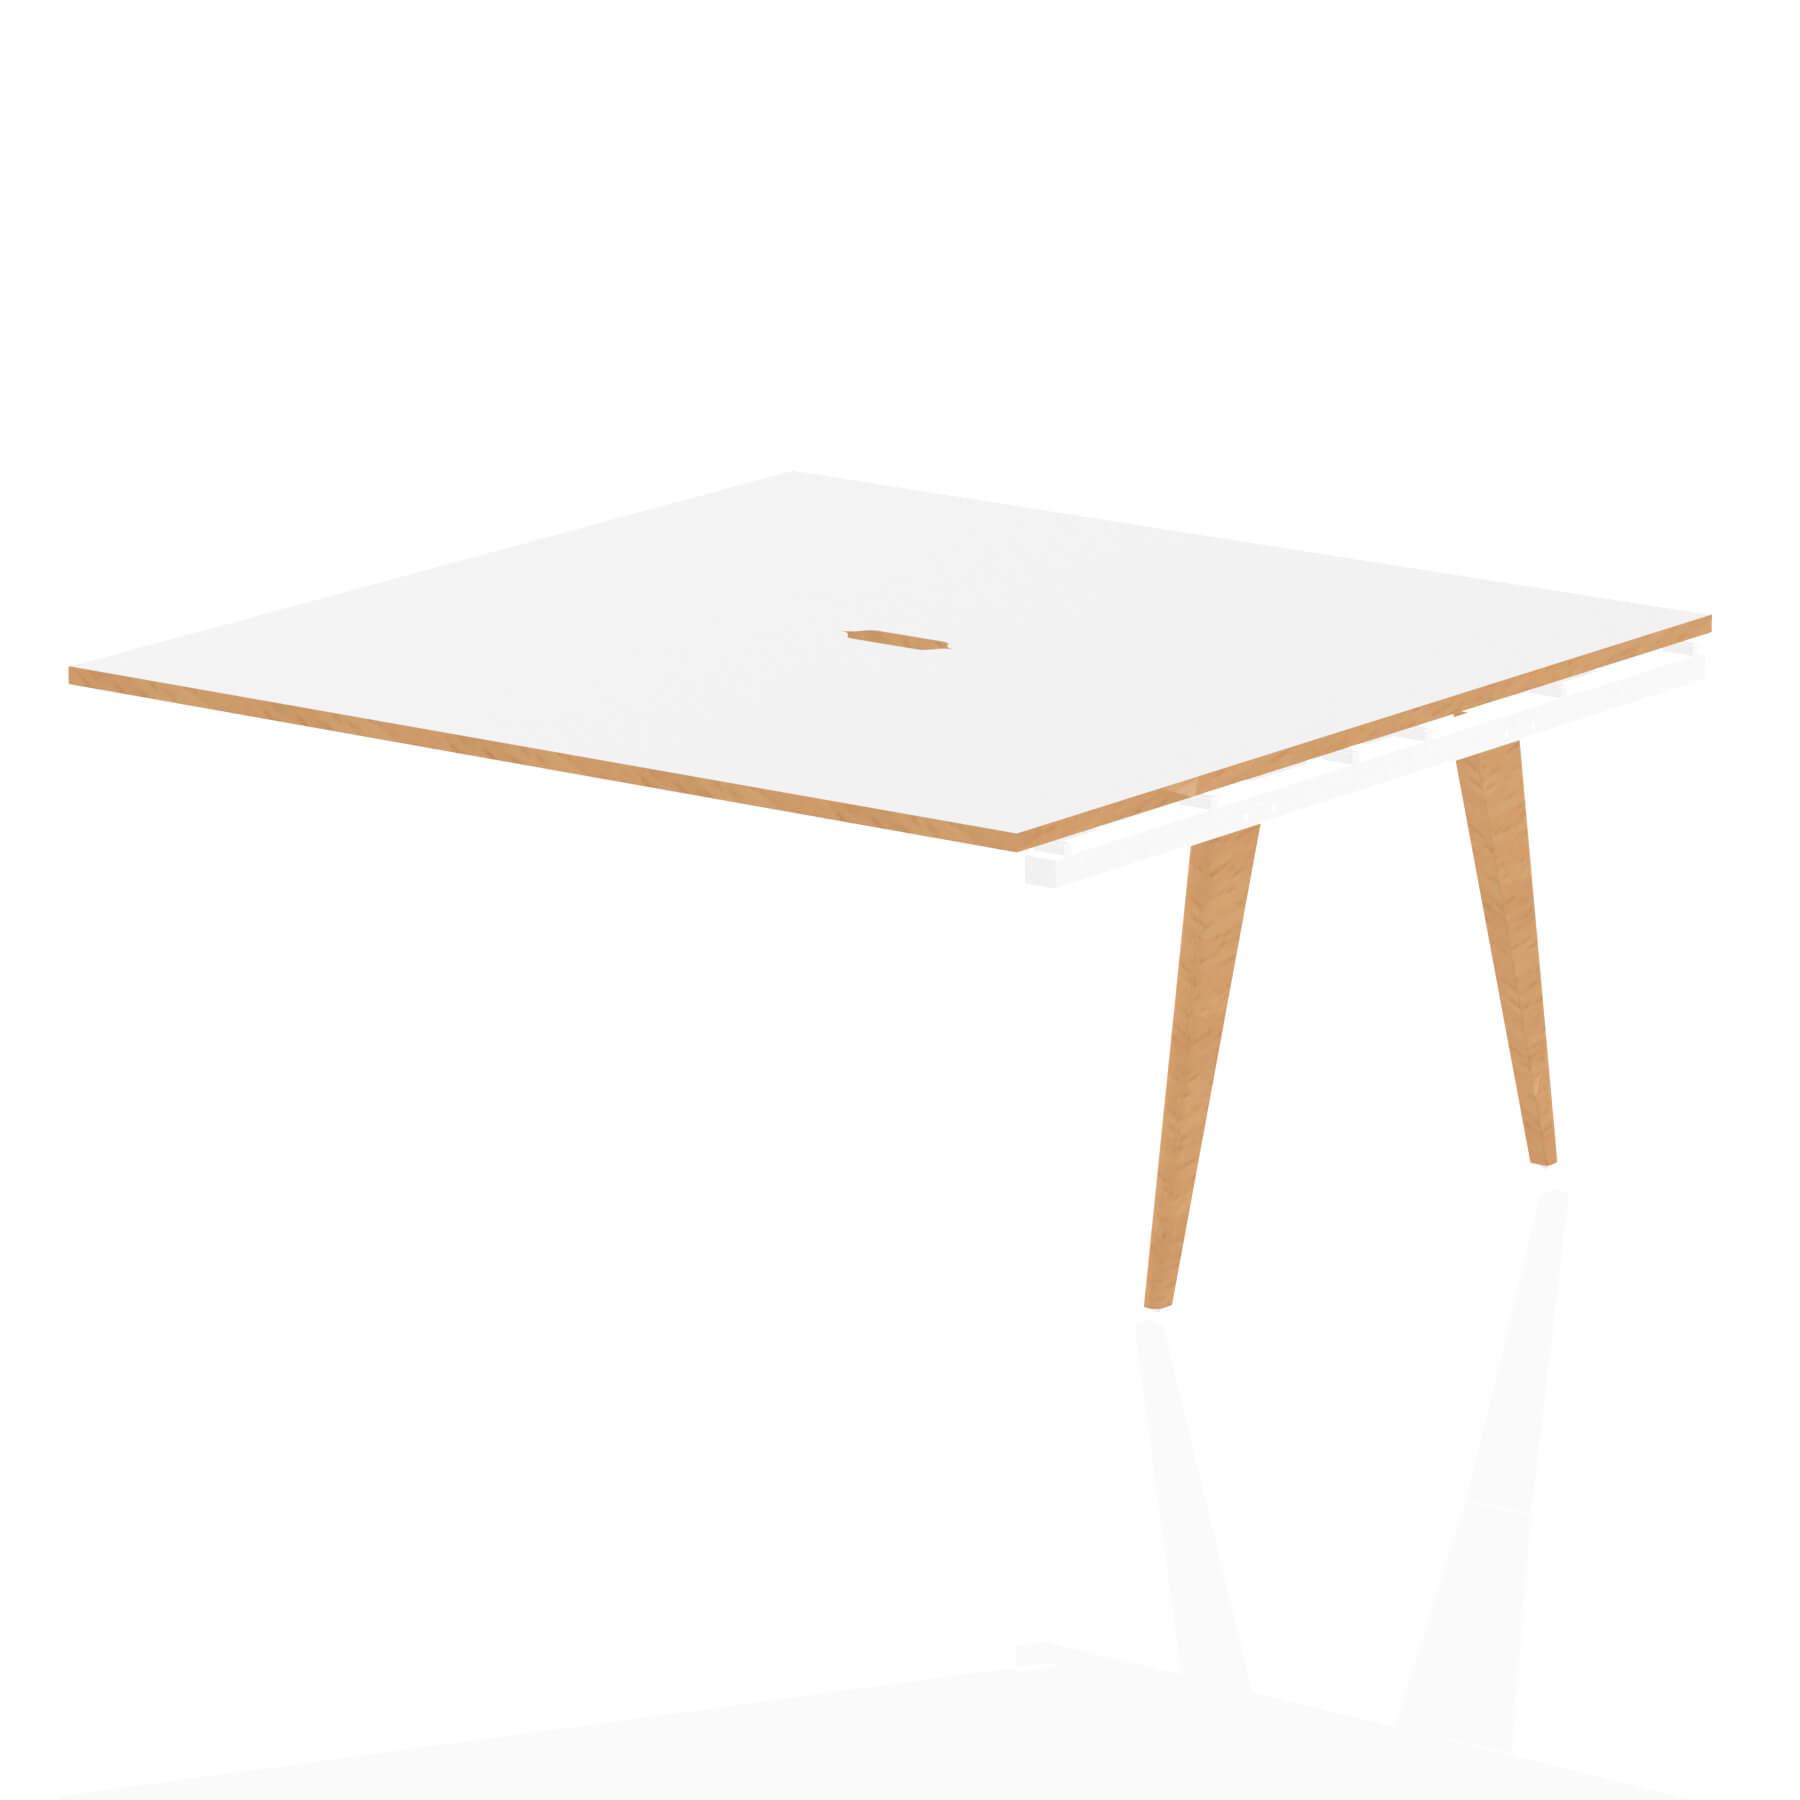 Oslo B2B Ext Kit White Frame Wooden Leg Bench Desk 1600 White With Natural Wood Edge